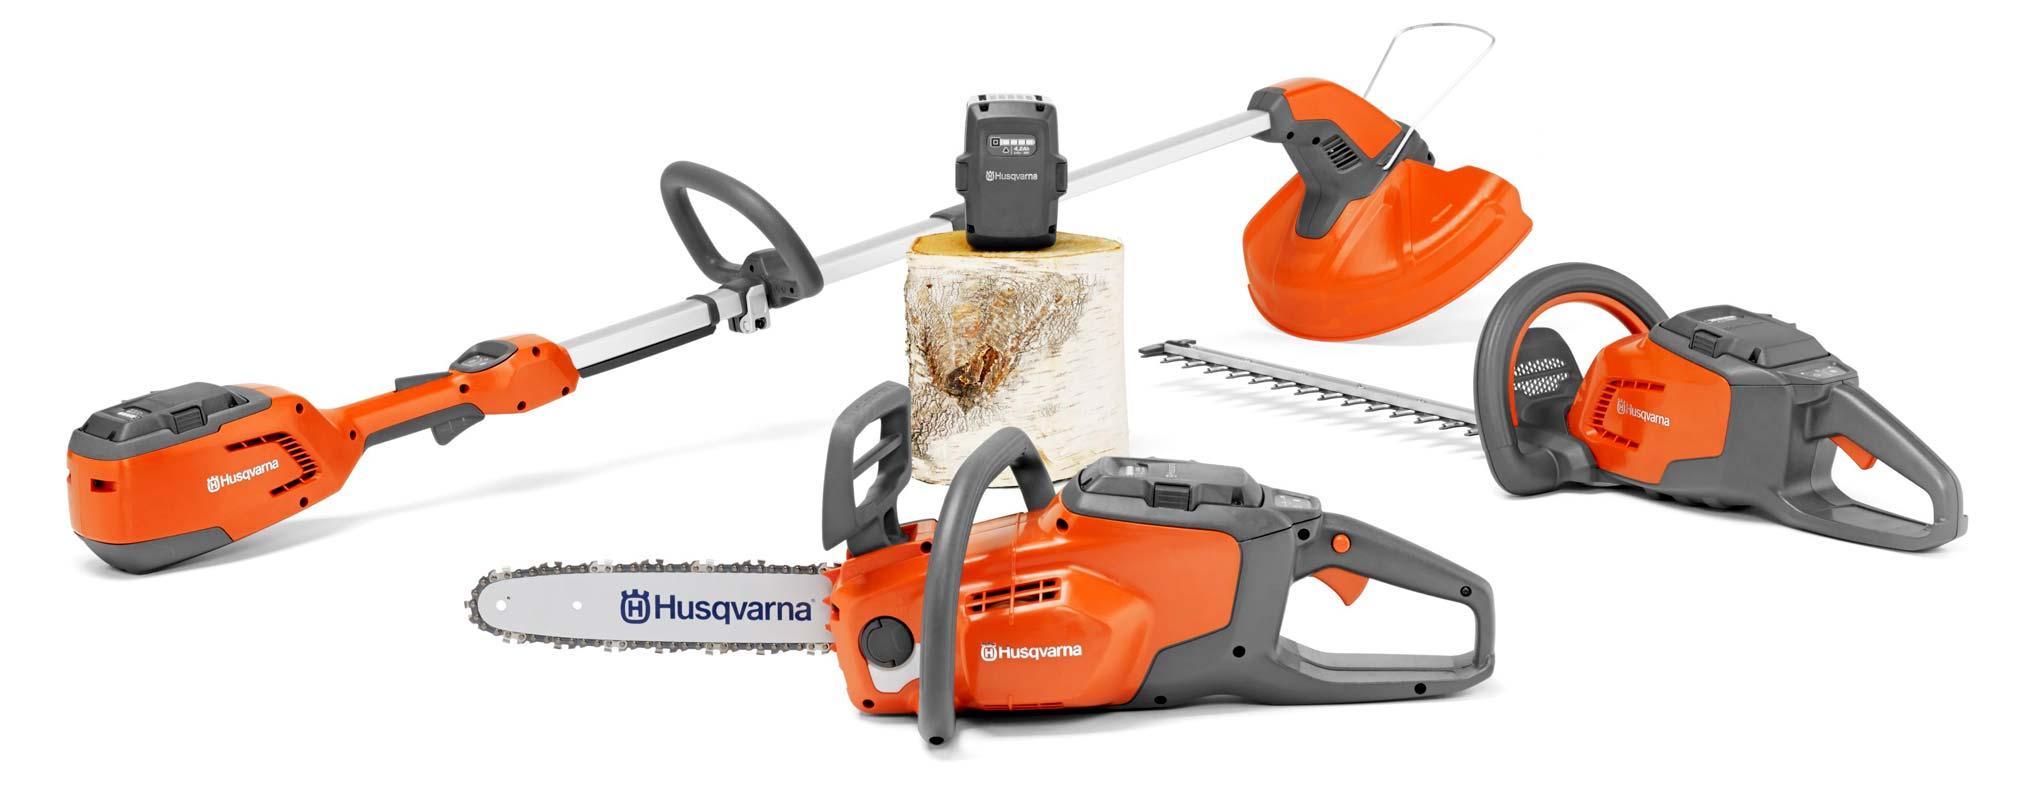 Husqvarna 115iHD45 Battery Powered Hedge Trimmer Galway